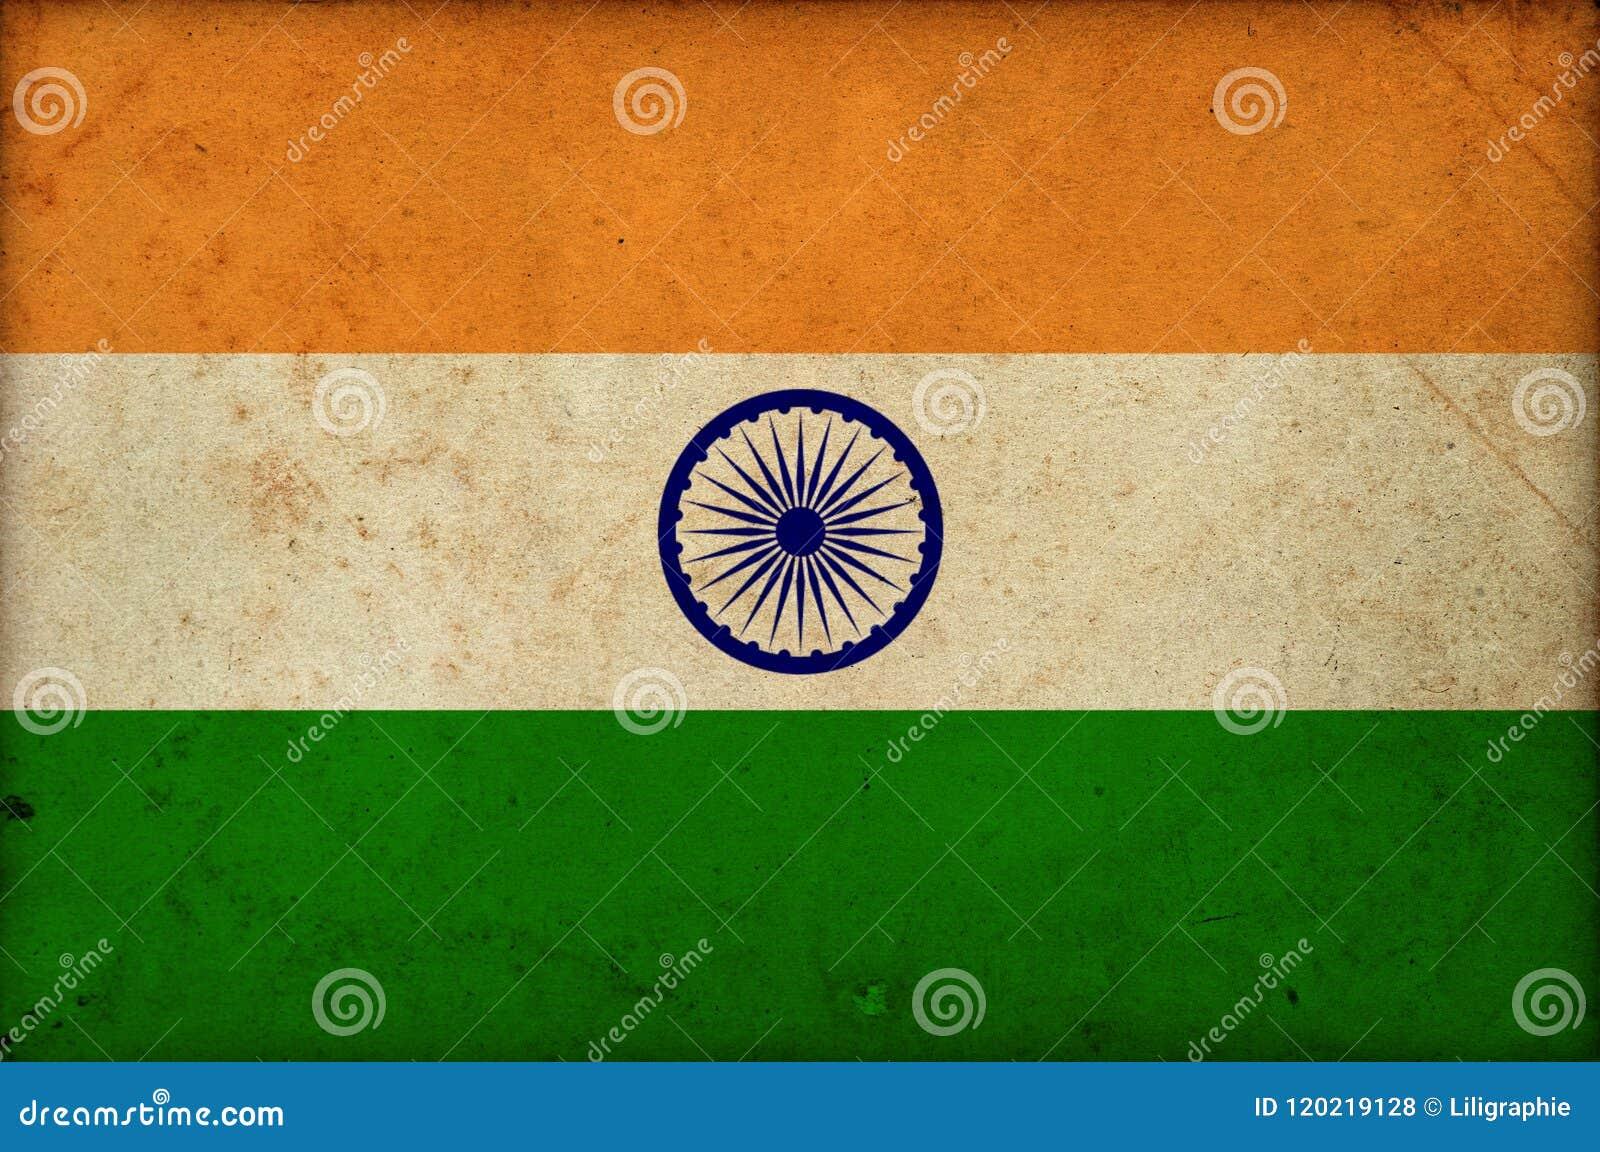 Grunge national indian flag India independence day